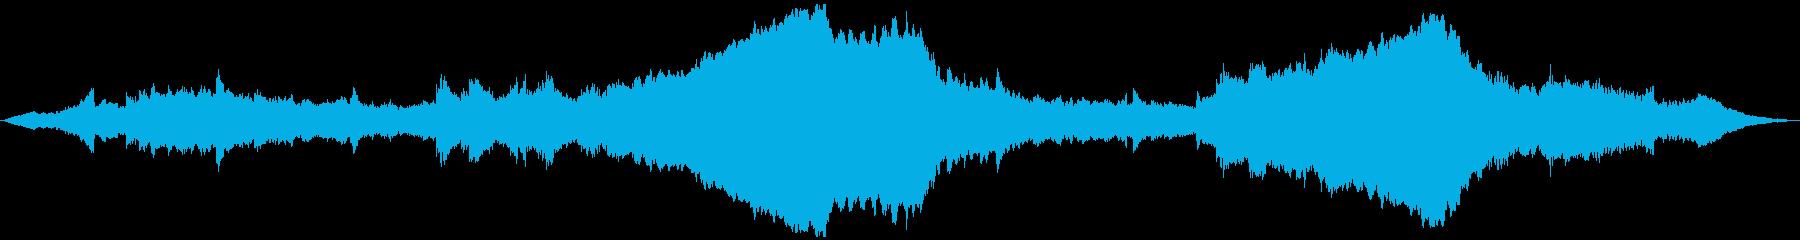 PADS 逆チャイム01の再生済みの波形